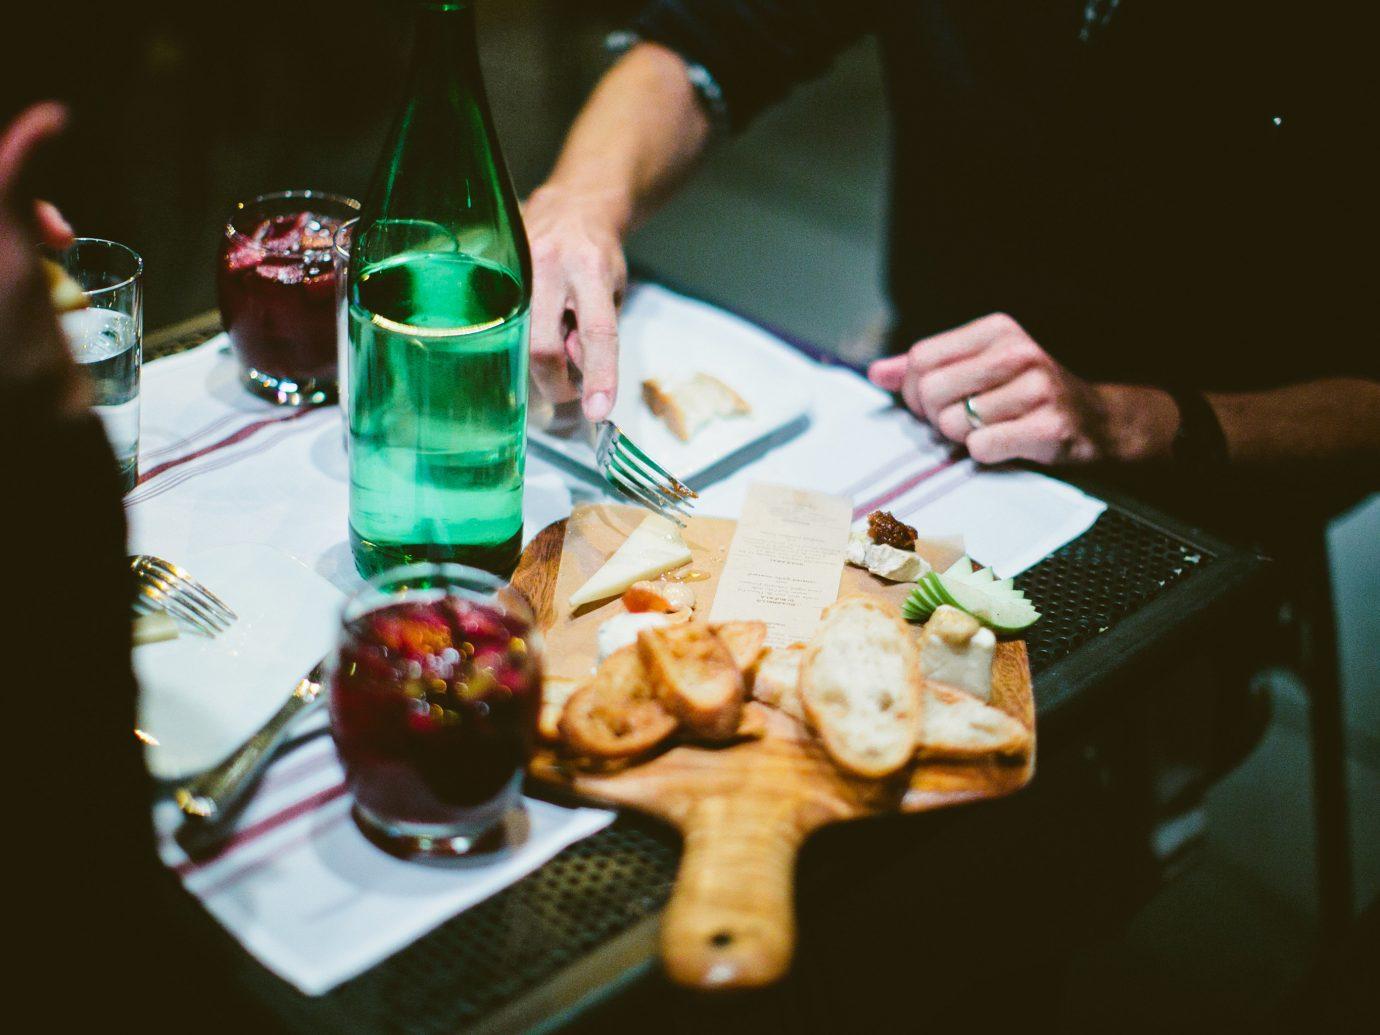 Food + Drink person table color indoor Drink sense meal